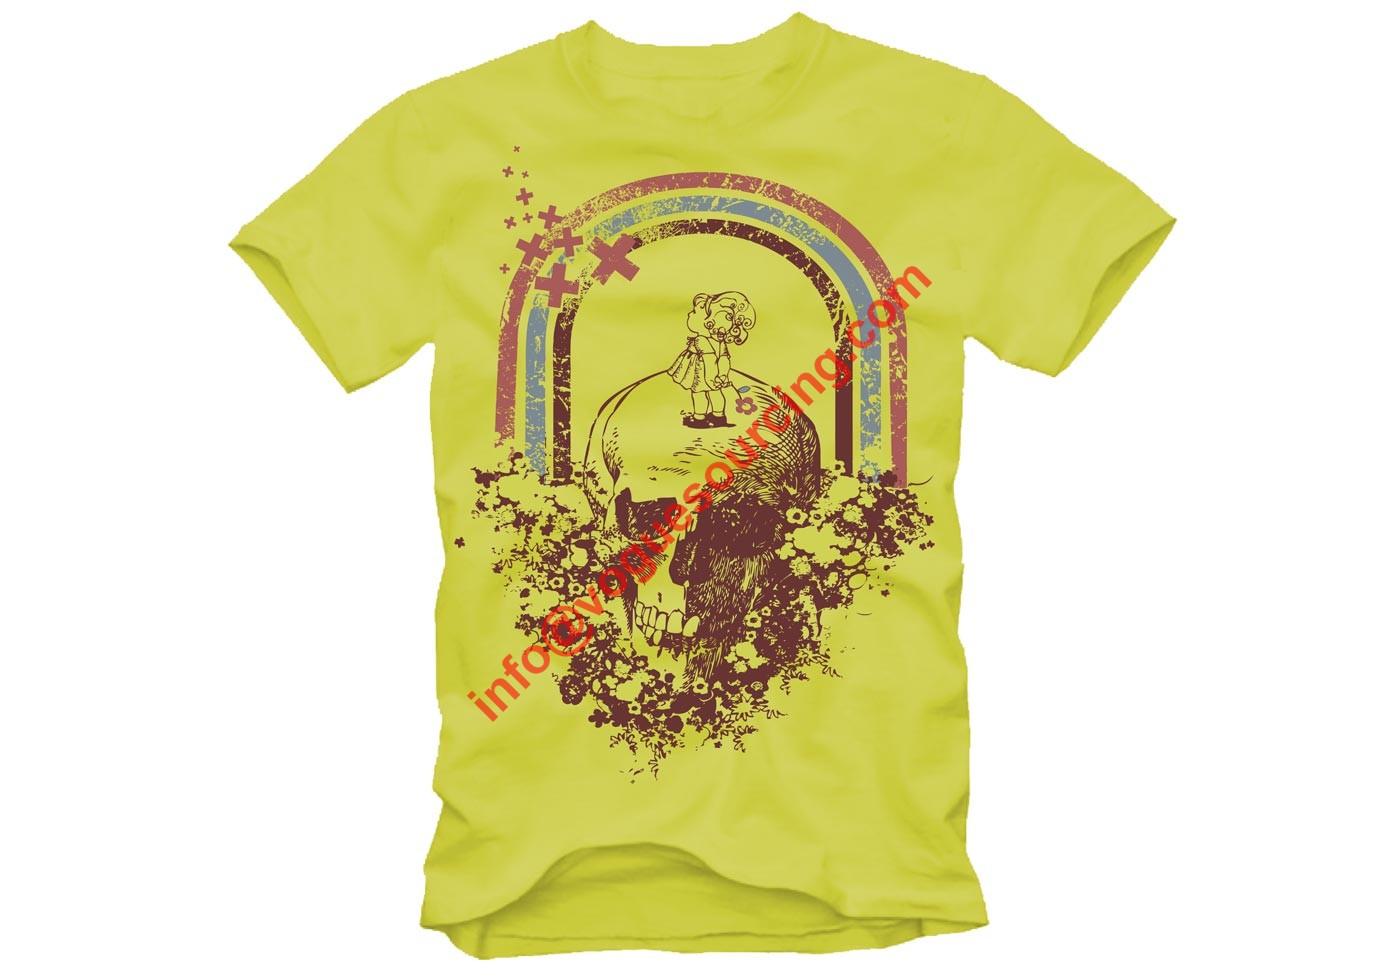 vector-t-shirts-manufacturers-voguesourcing-tirupur-india